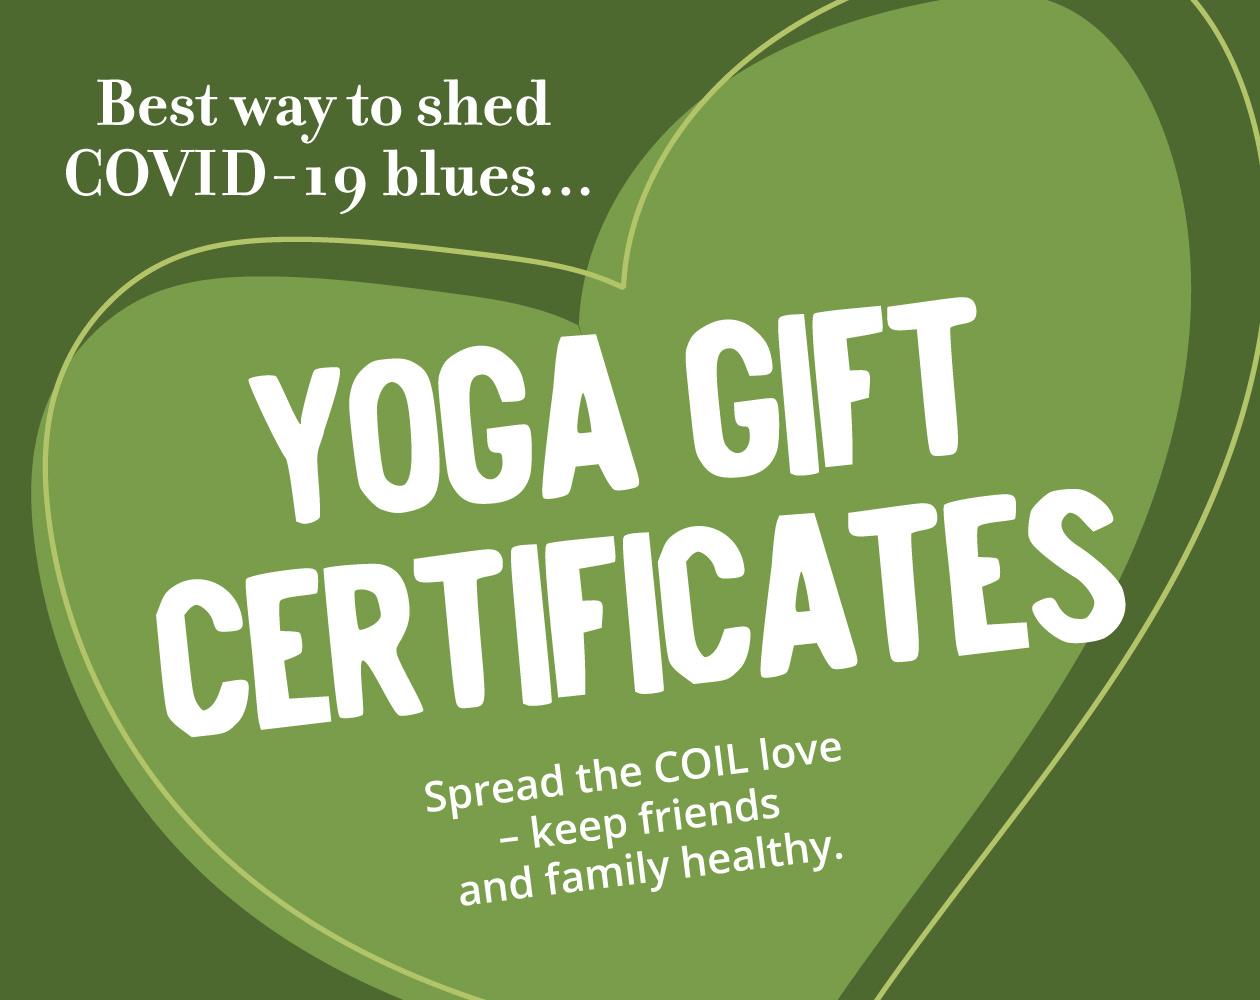 Yoga Gift Certificates